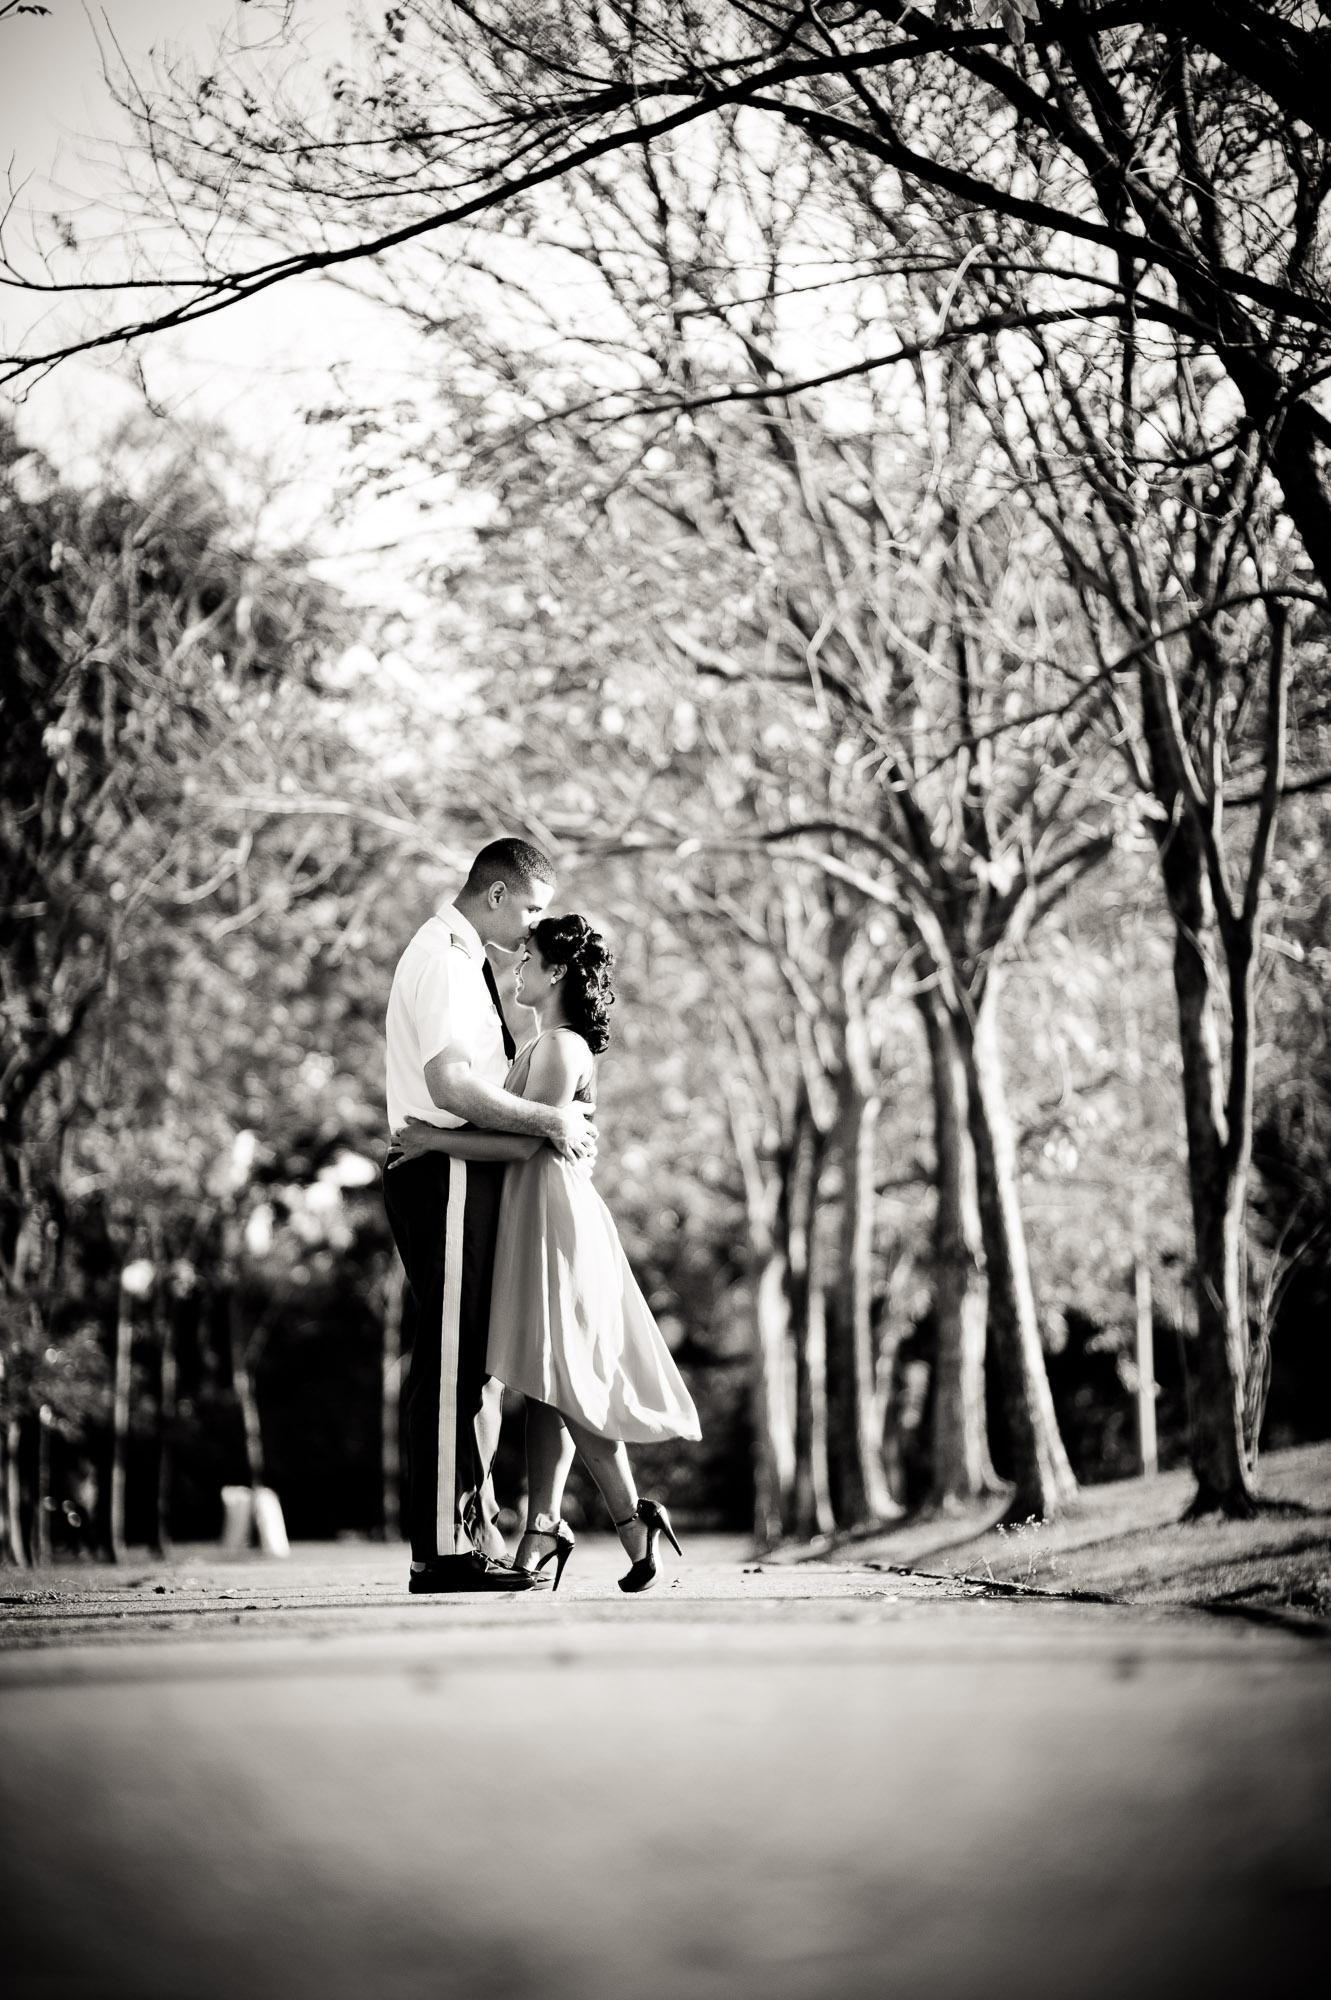 Bangkok Thailand Wedding Photography | ภาพคู่แต่งงาน ถ่ายที่สวนรถไฟ